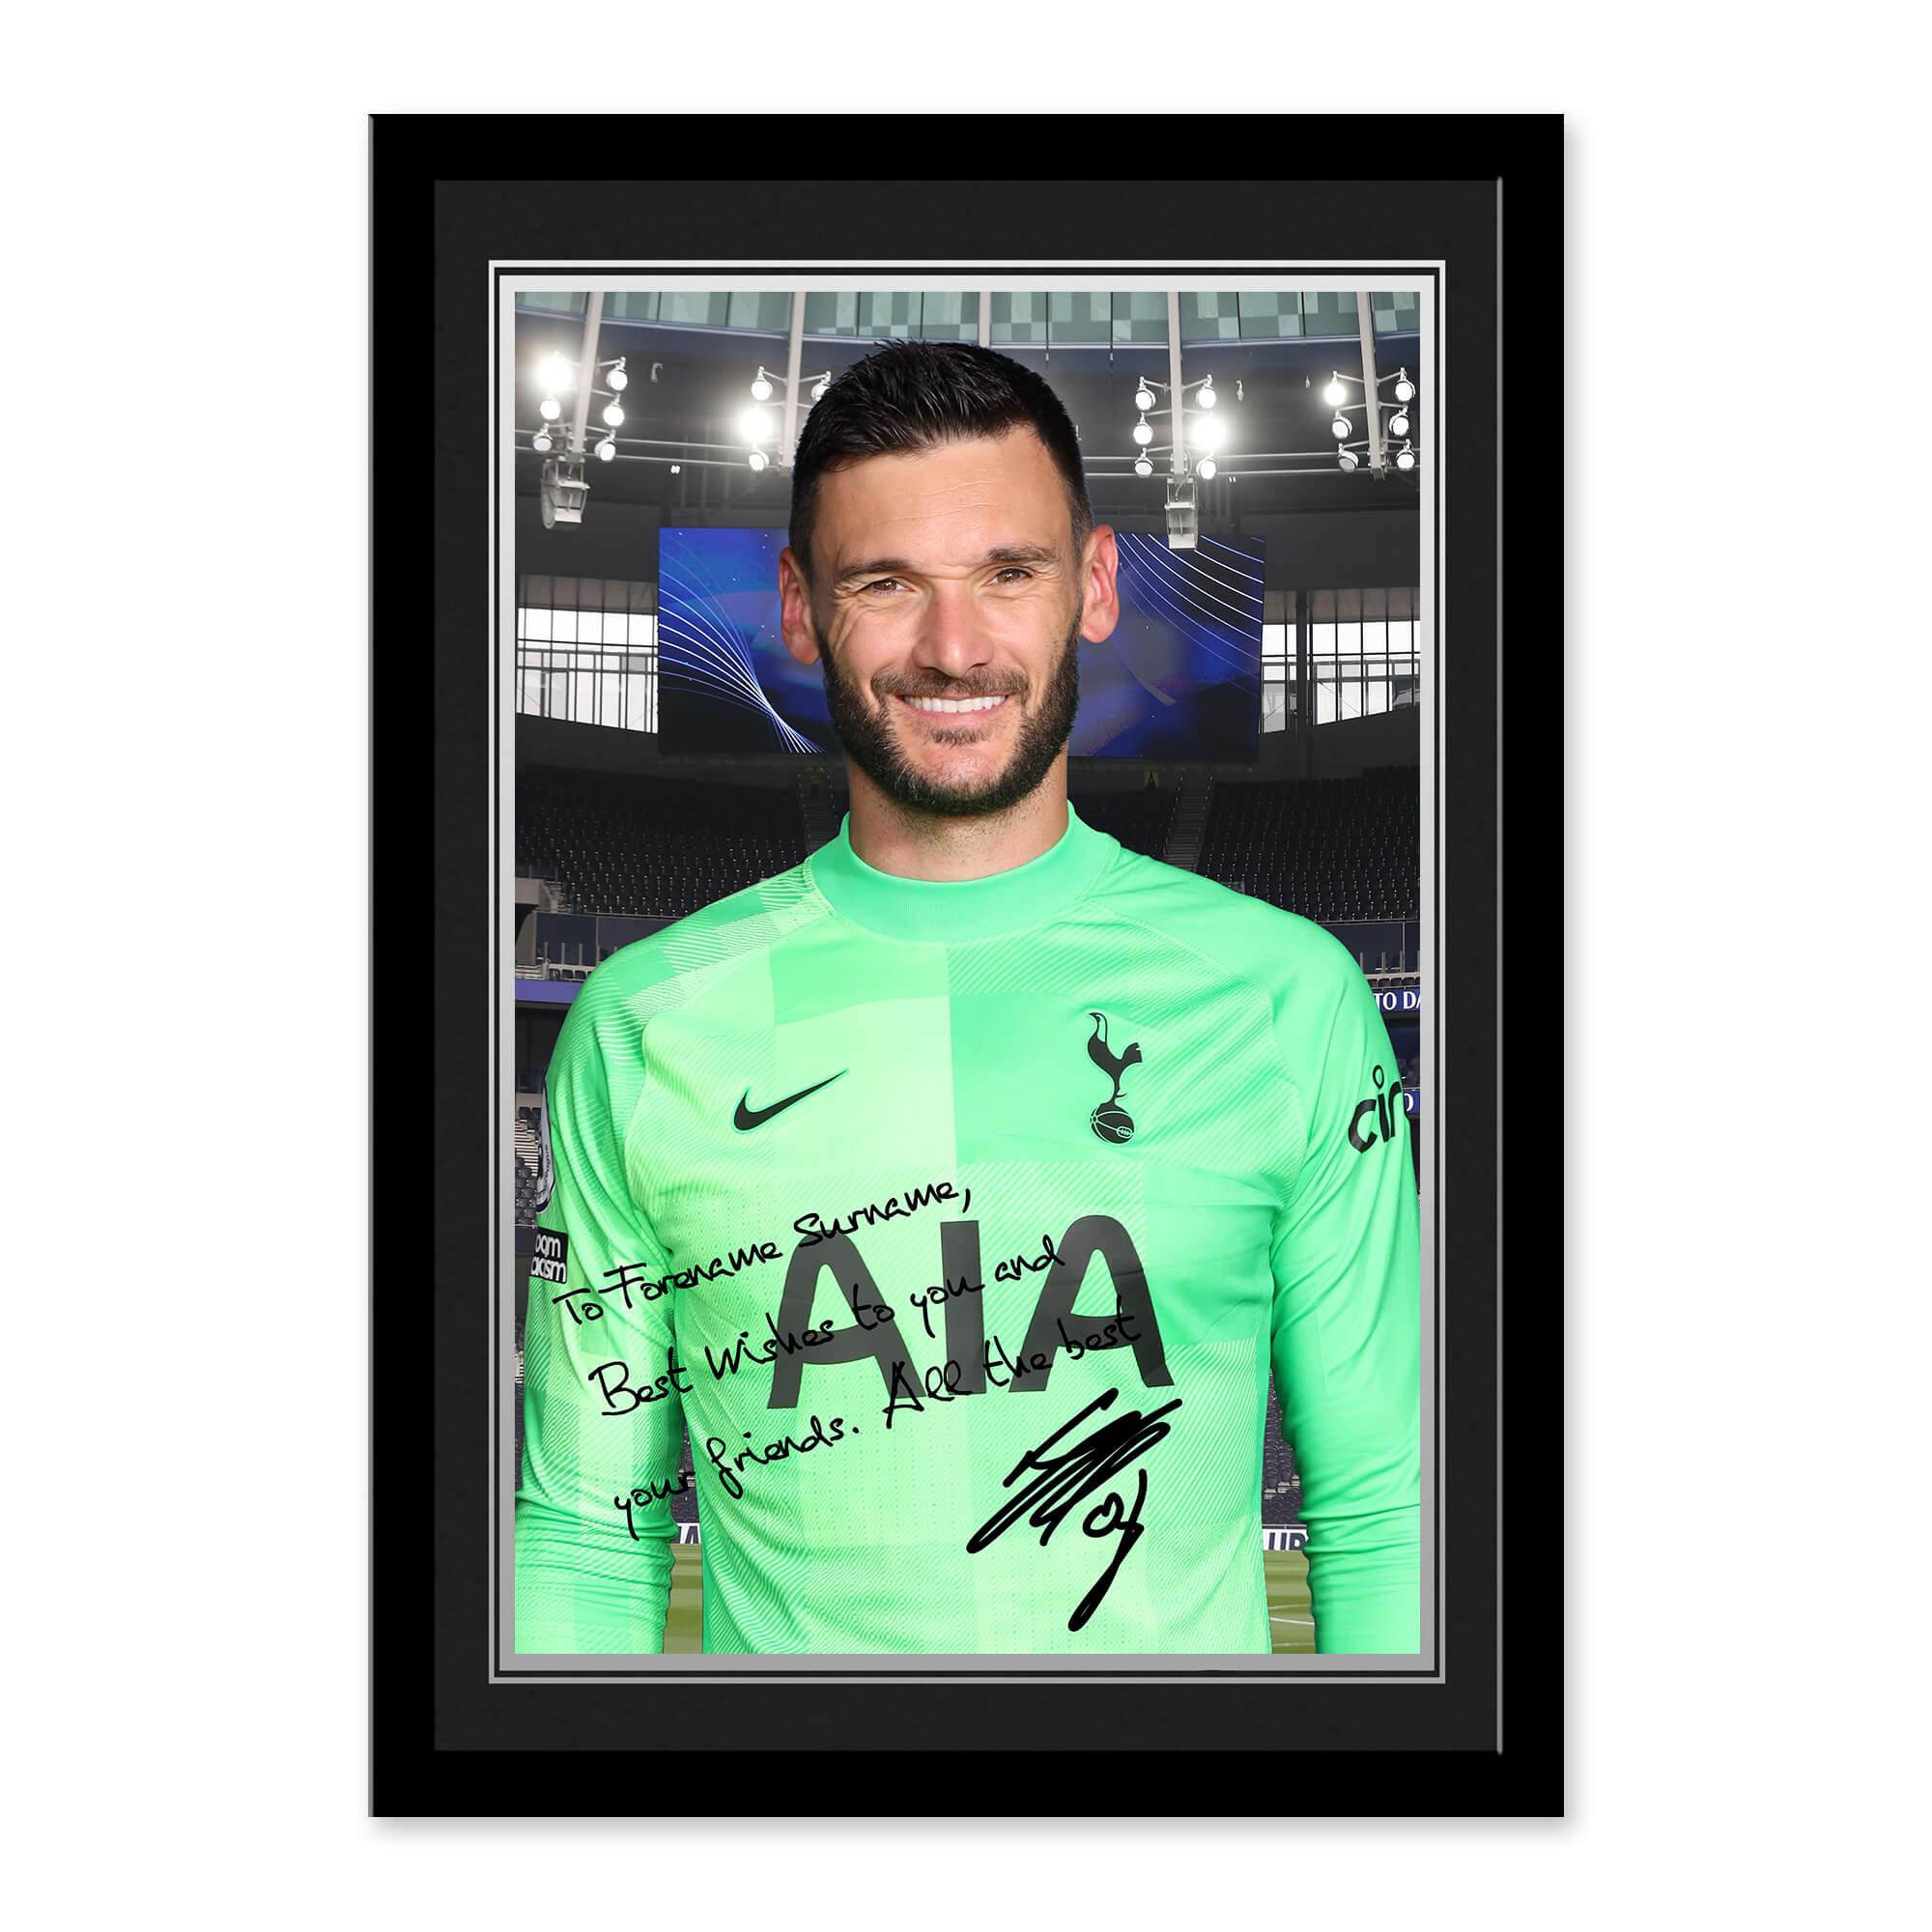 Tottenham Hotspur Lloris Autograph Photo Framed